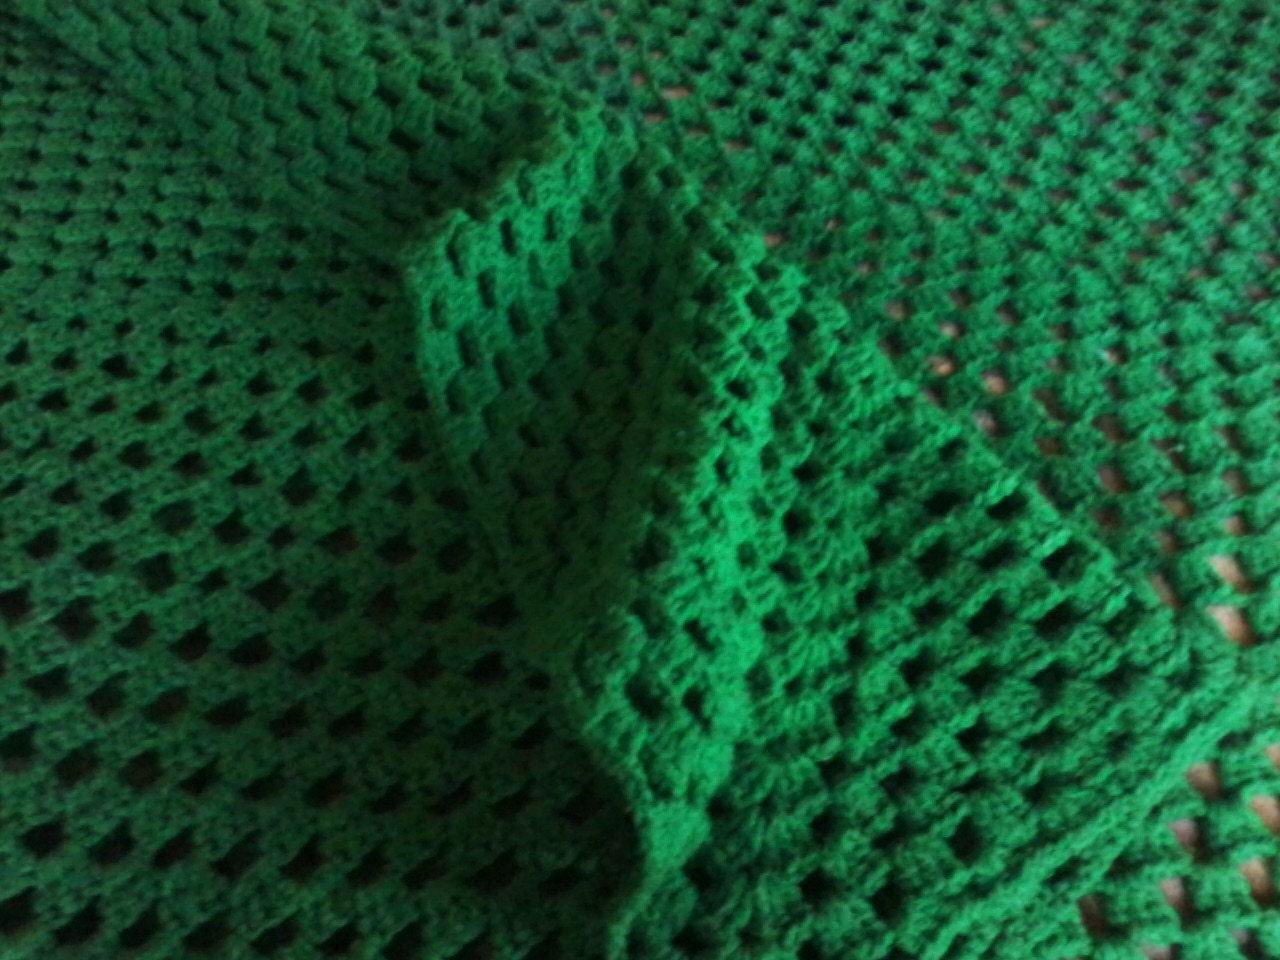 Green crocheted throw blanket - Emerald green throw blanket ...